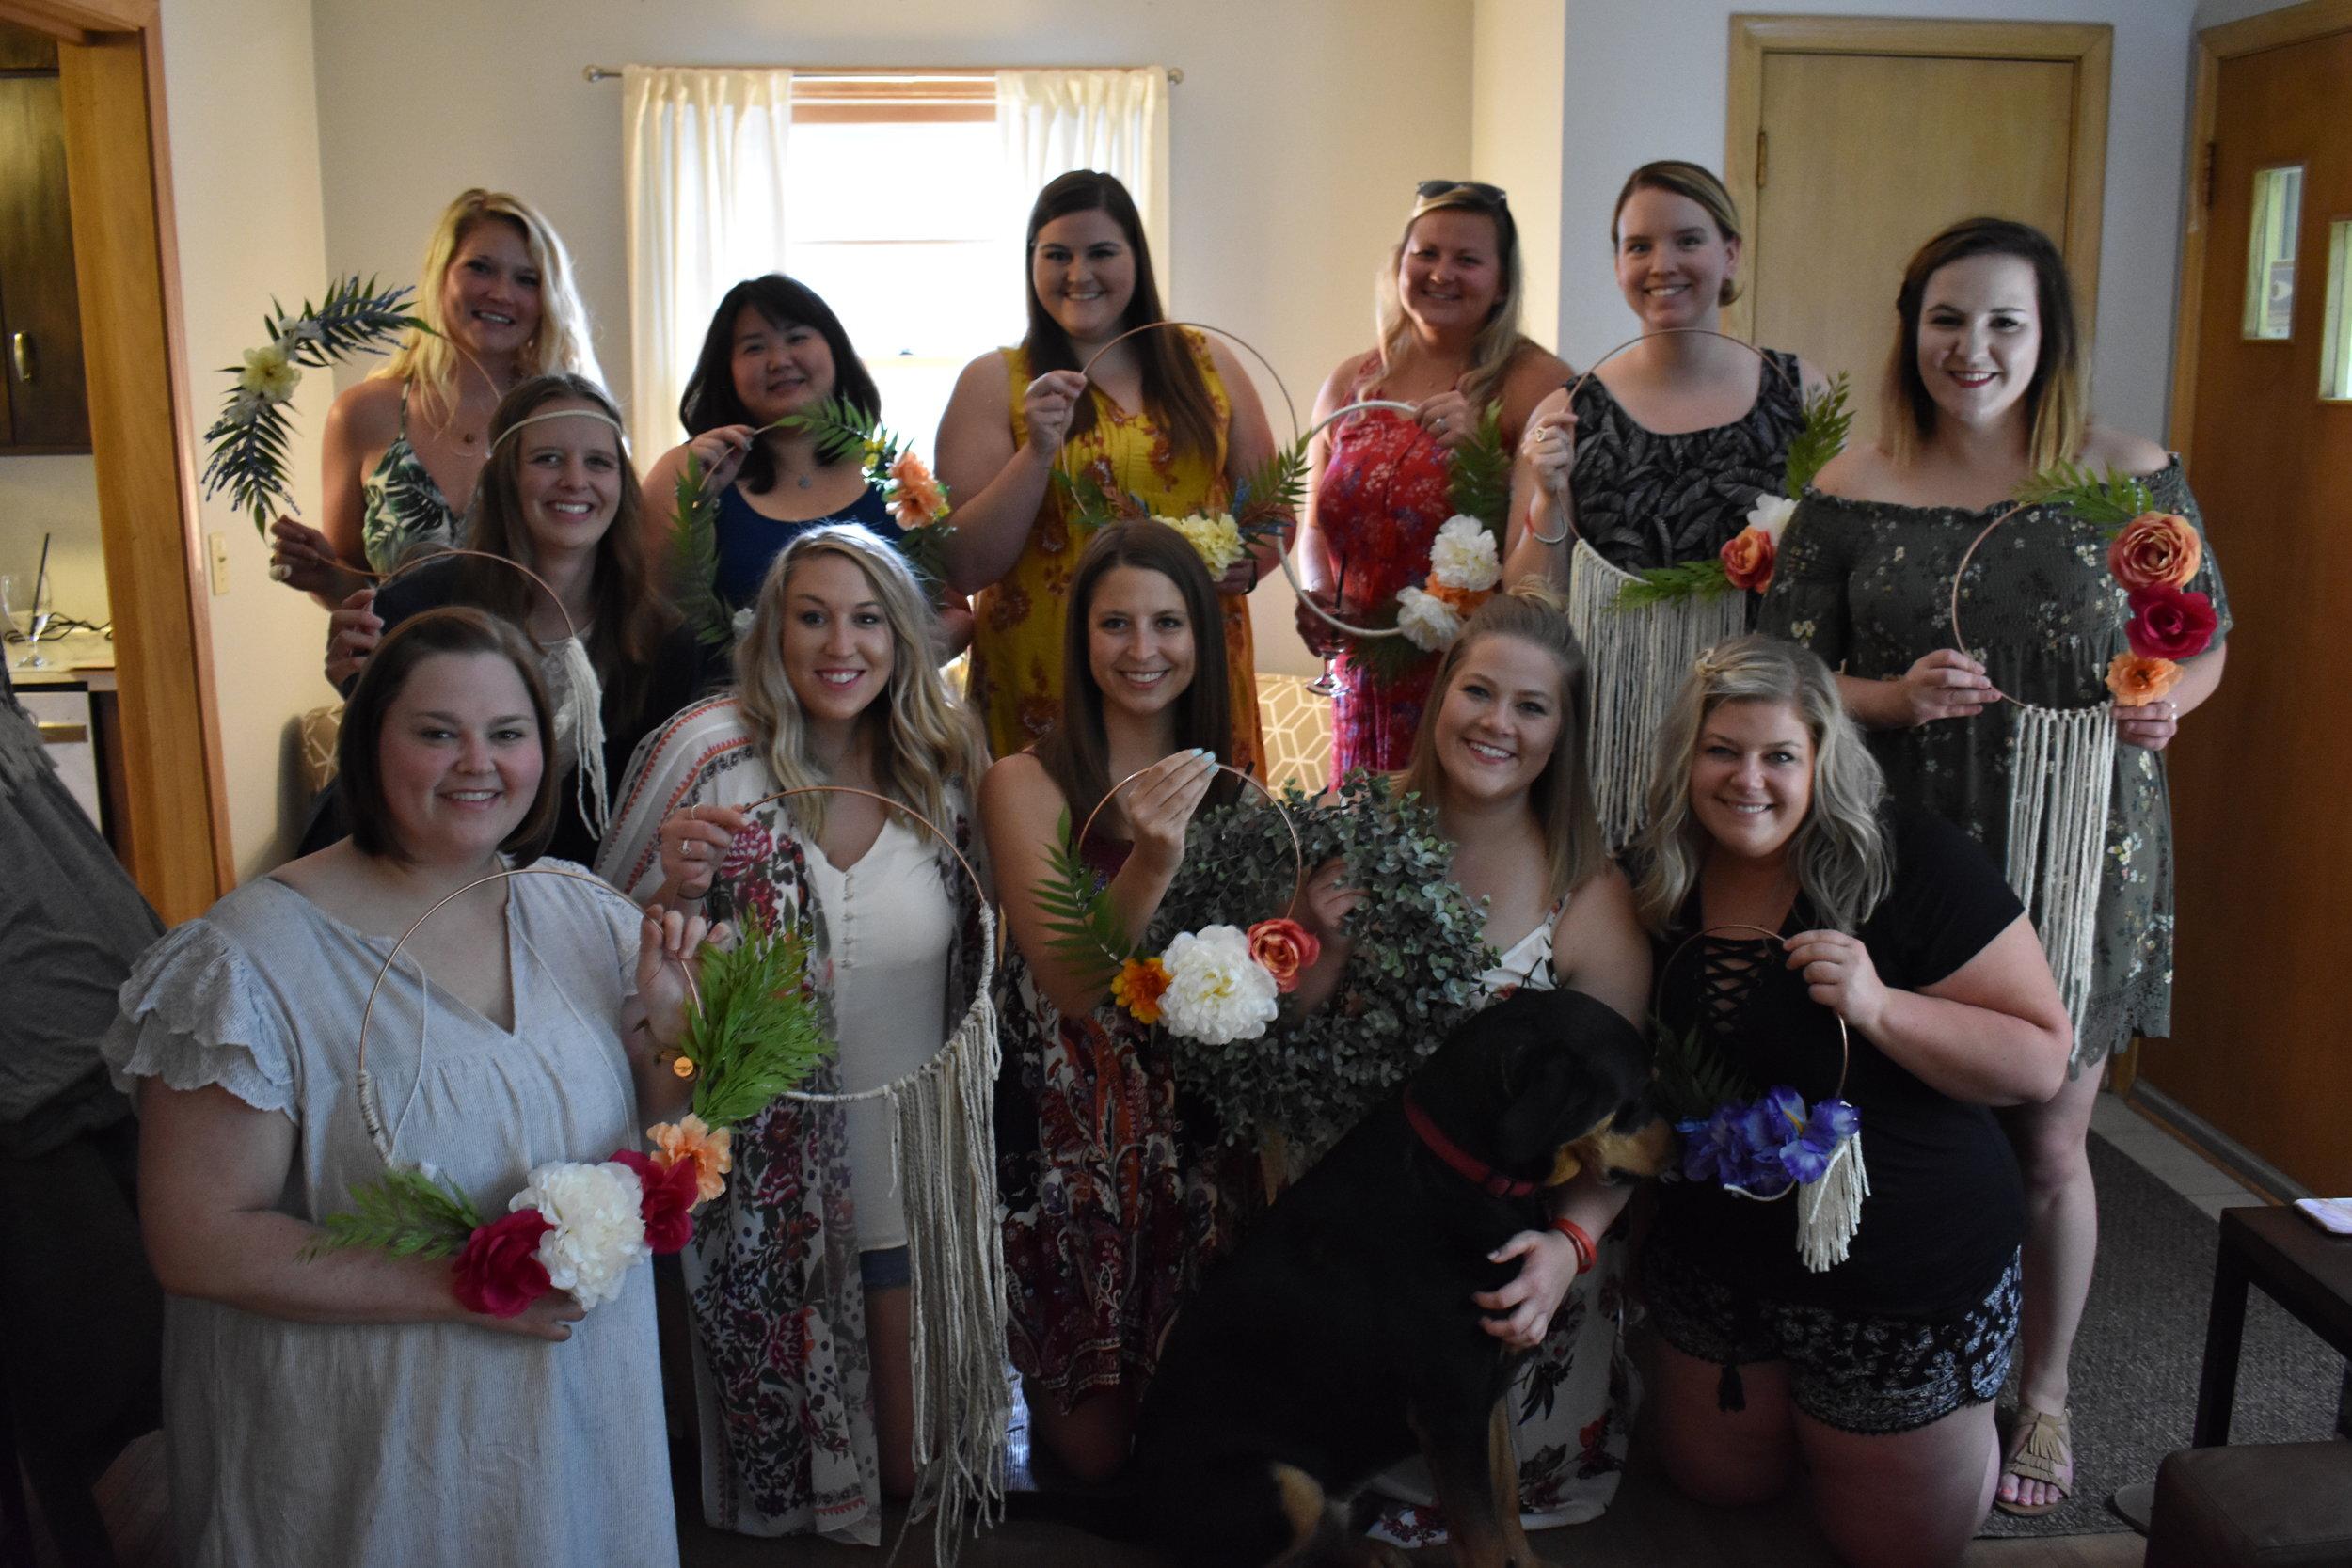 Boho Floral Wreath Craft DIY Party - Bridal Shower